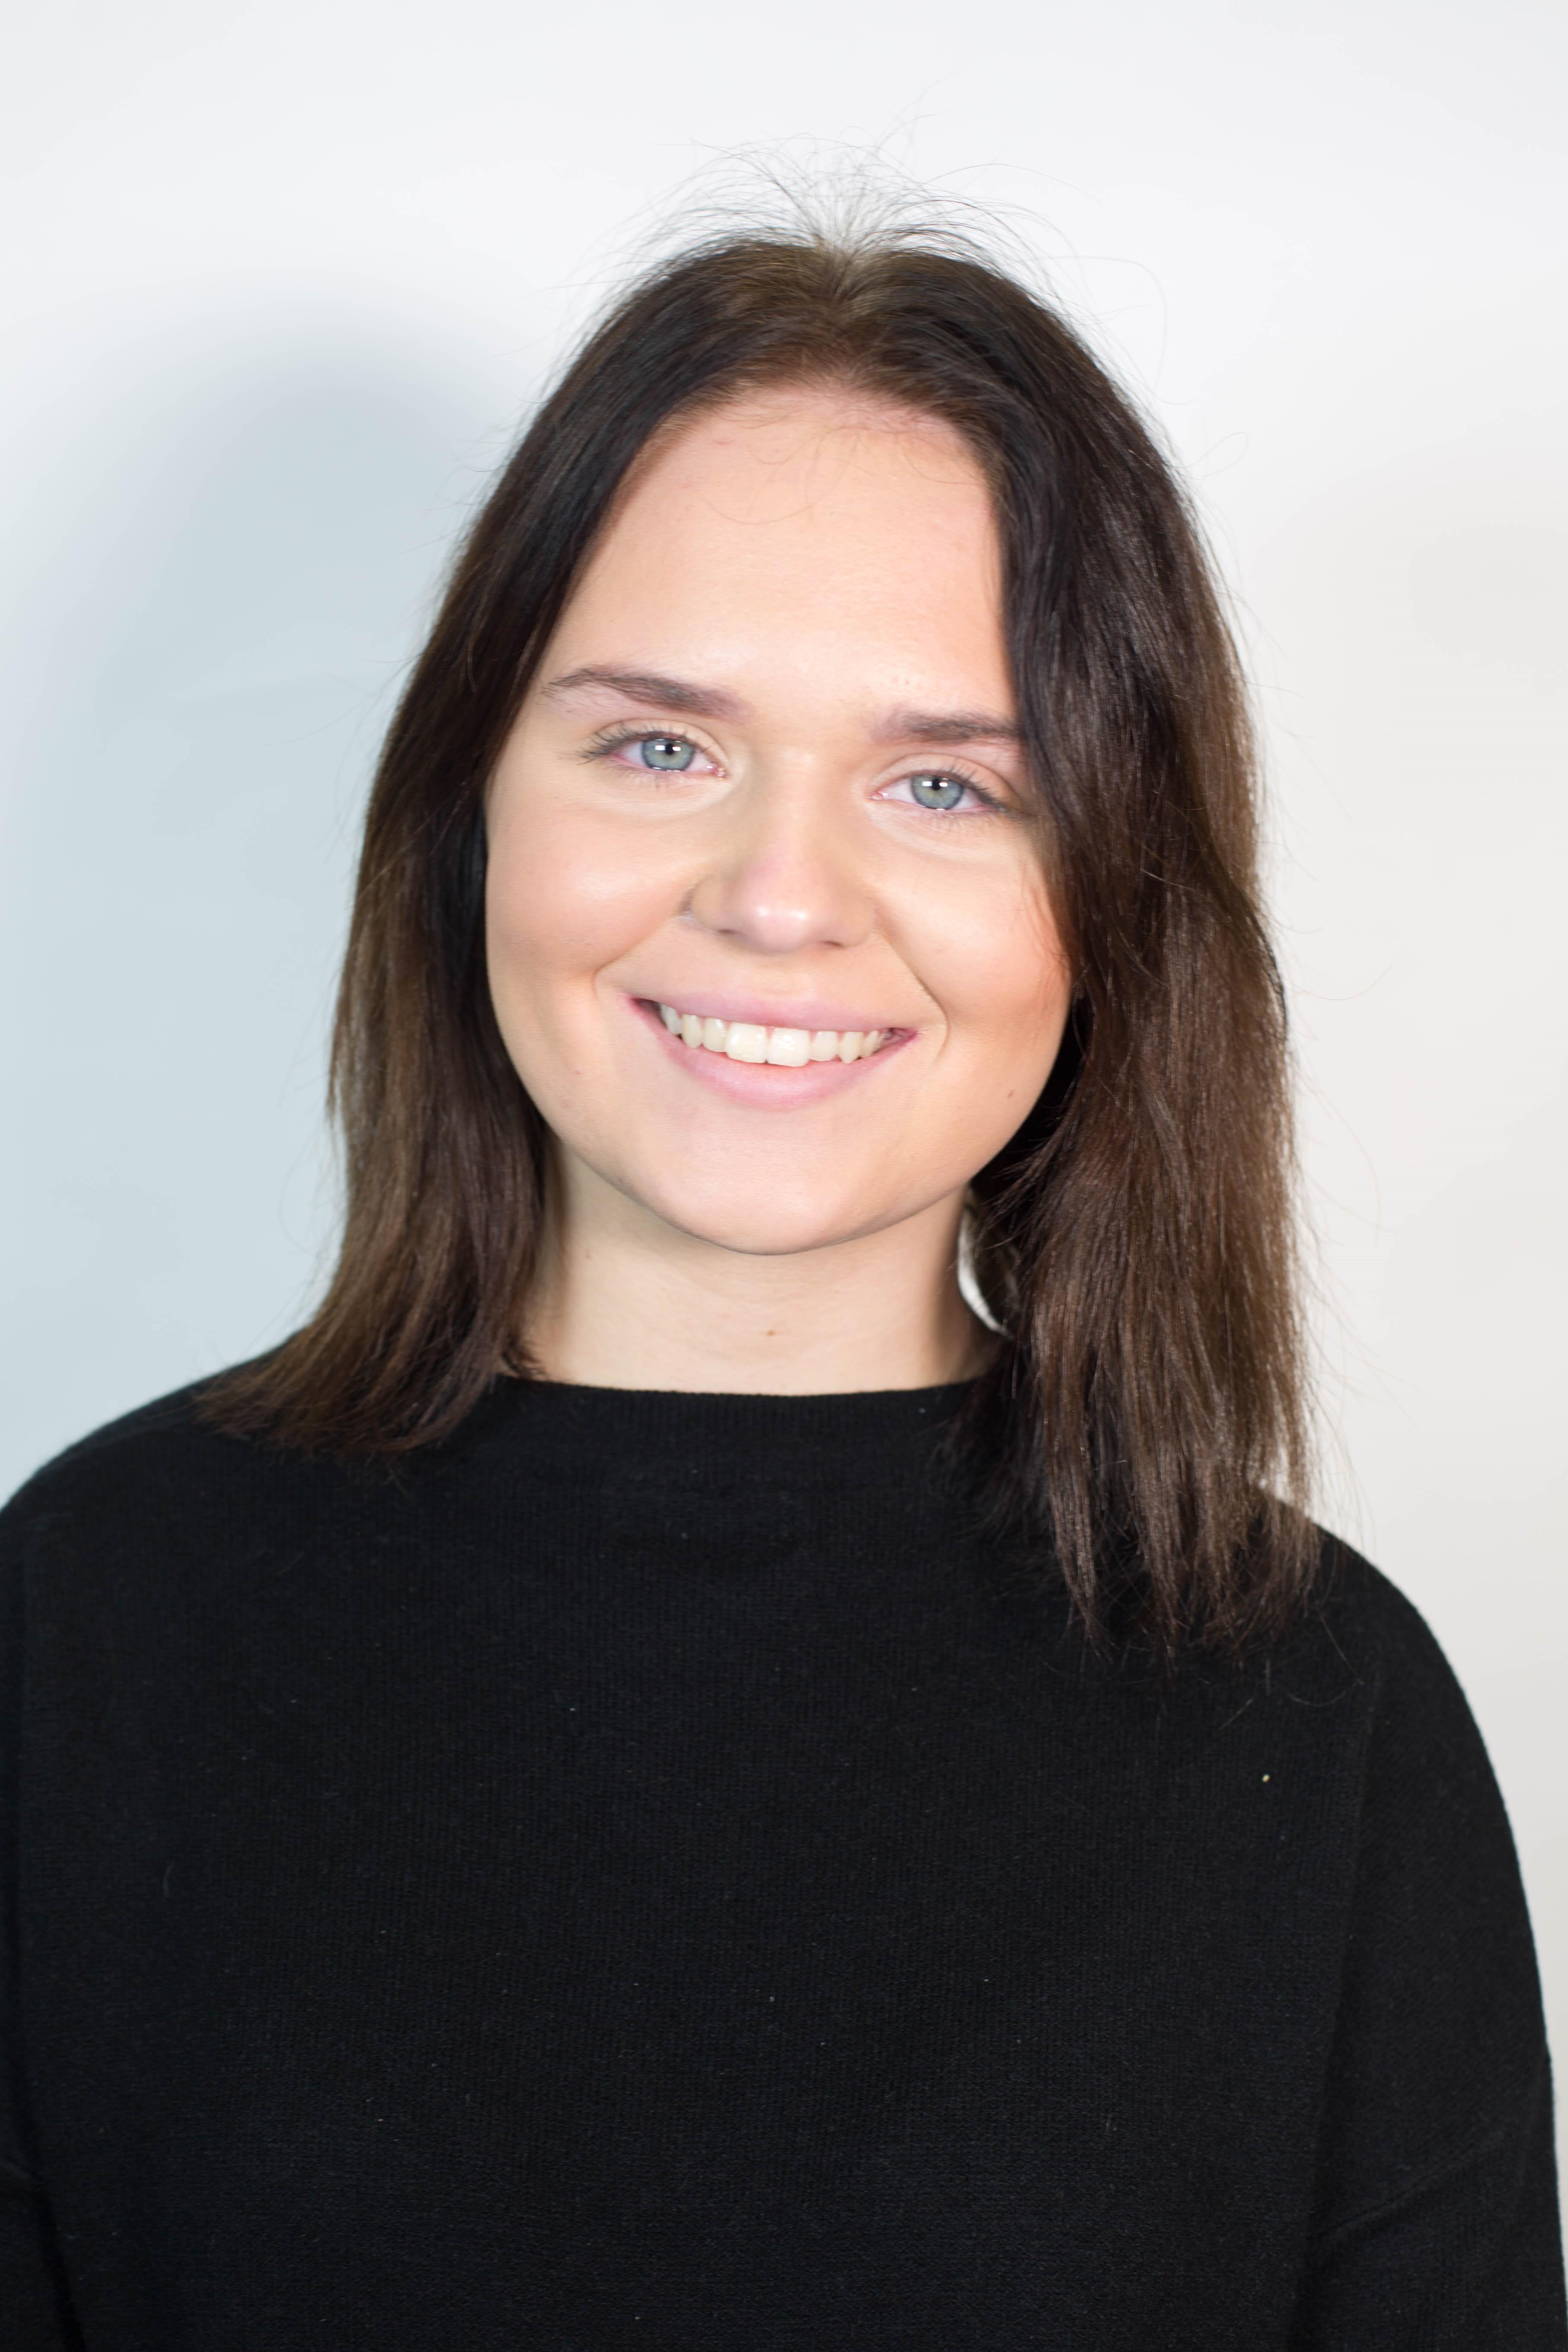 Jess Barton Headshot